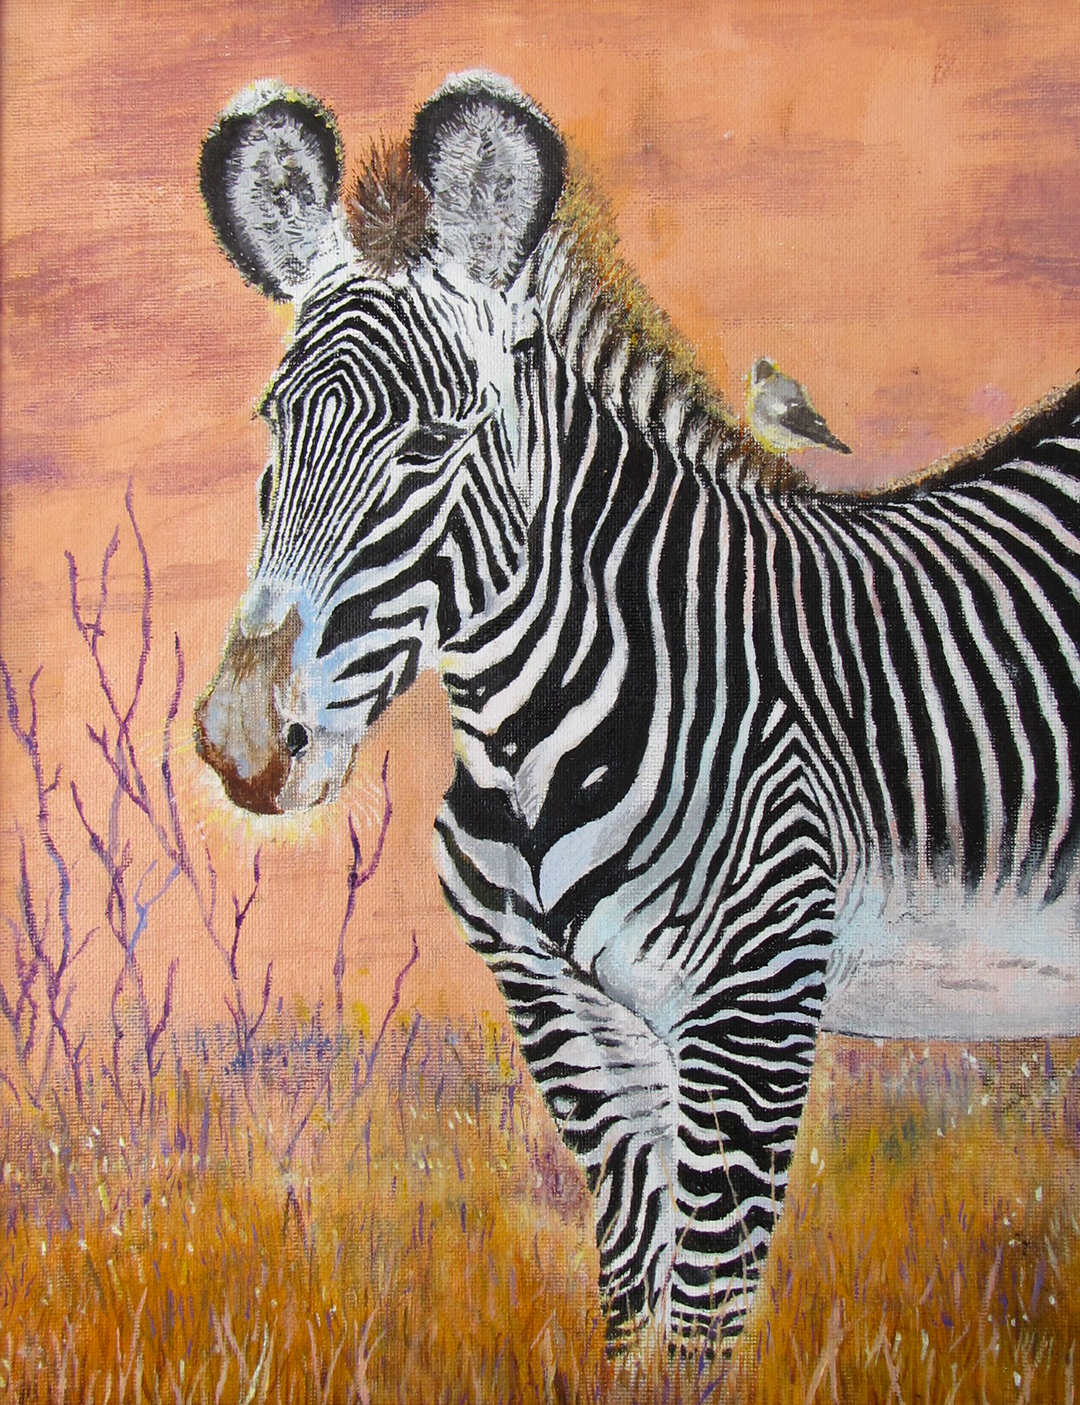 Grevy's Zebra © 2018 Cyrus Li | All Rights Reserved